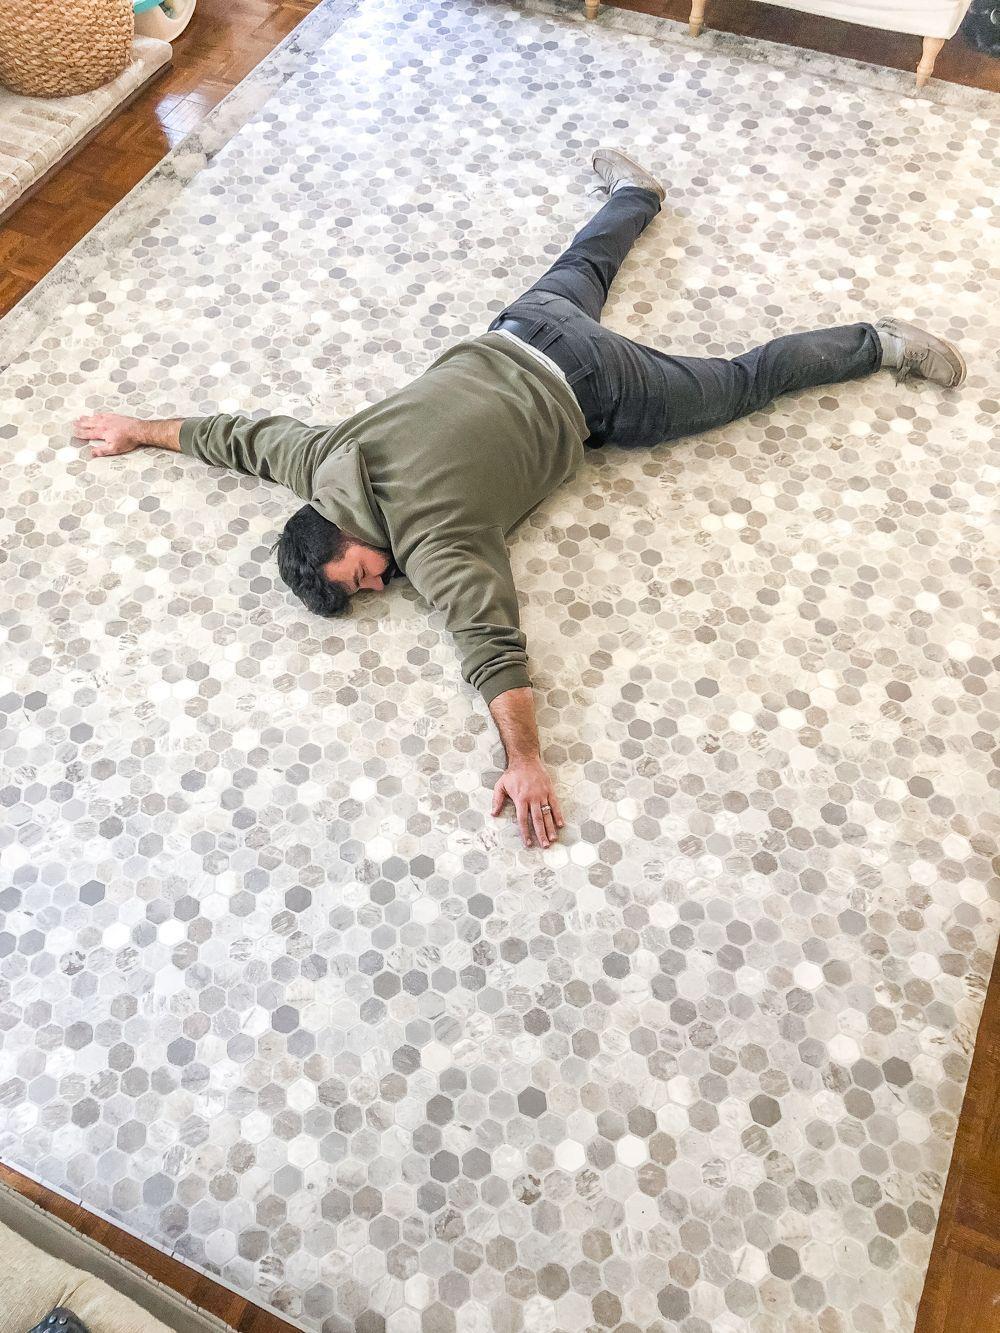 Stainmaster 18 In X 36 In Manor Travertine Luxury Vinyl Tile Grey Vinyl Plank Flooring Living Room Tiles Tile Floor Living Room